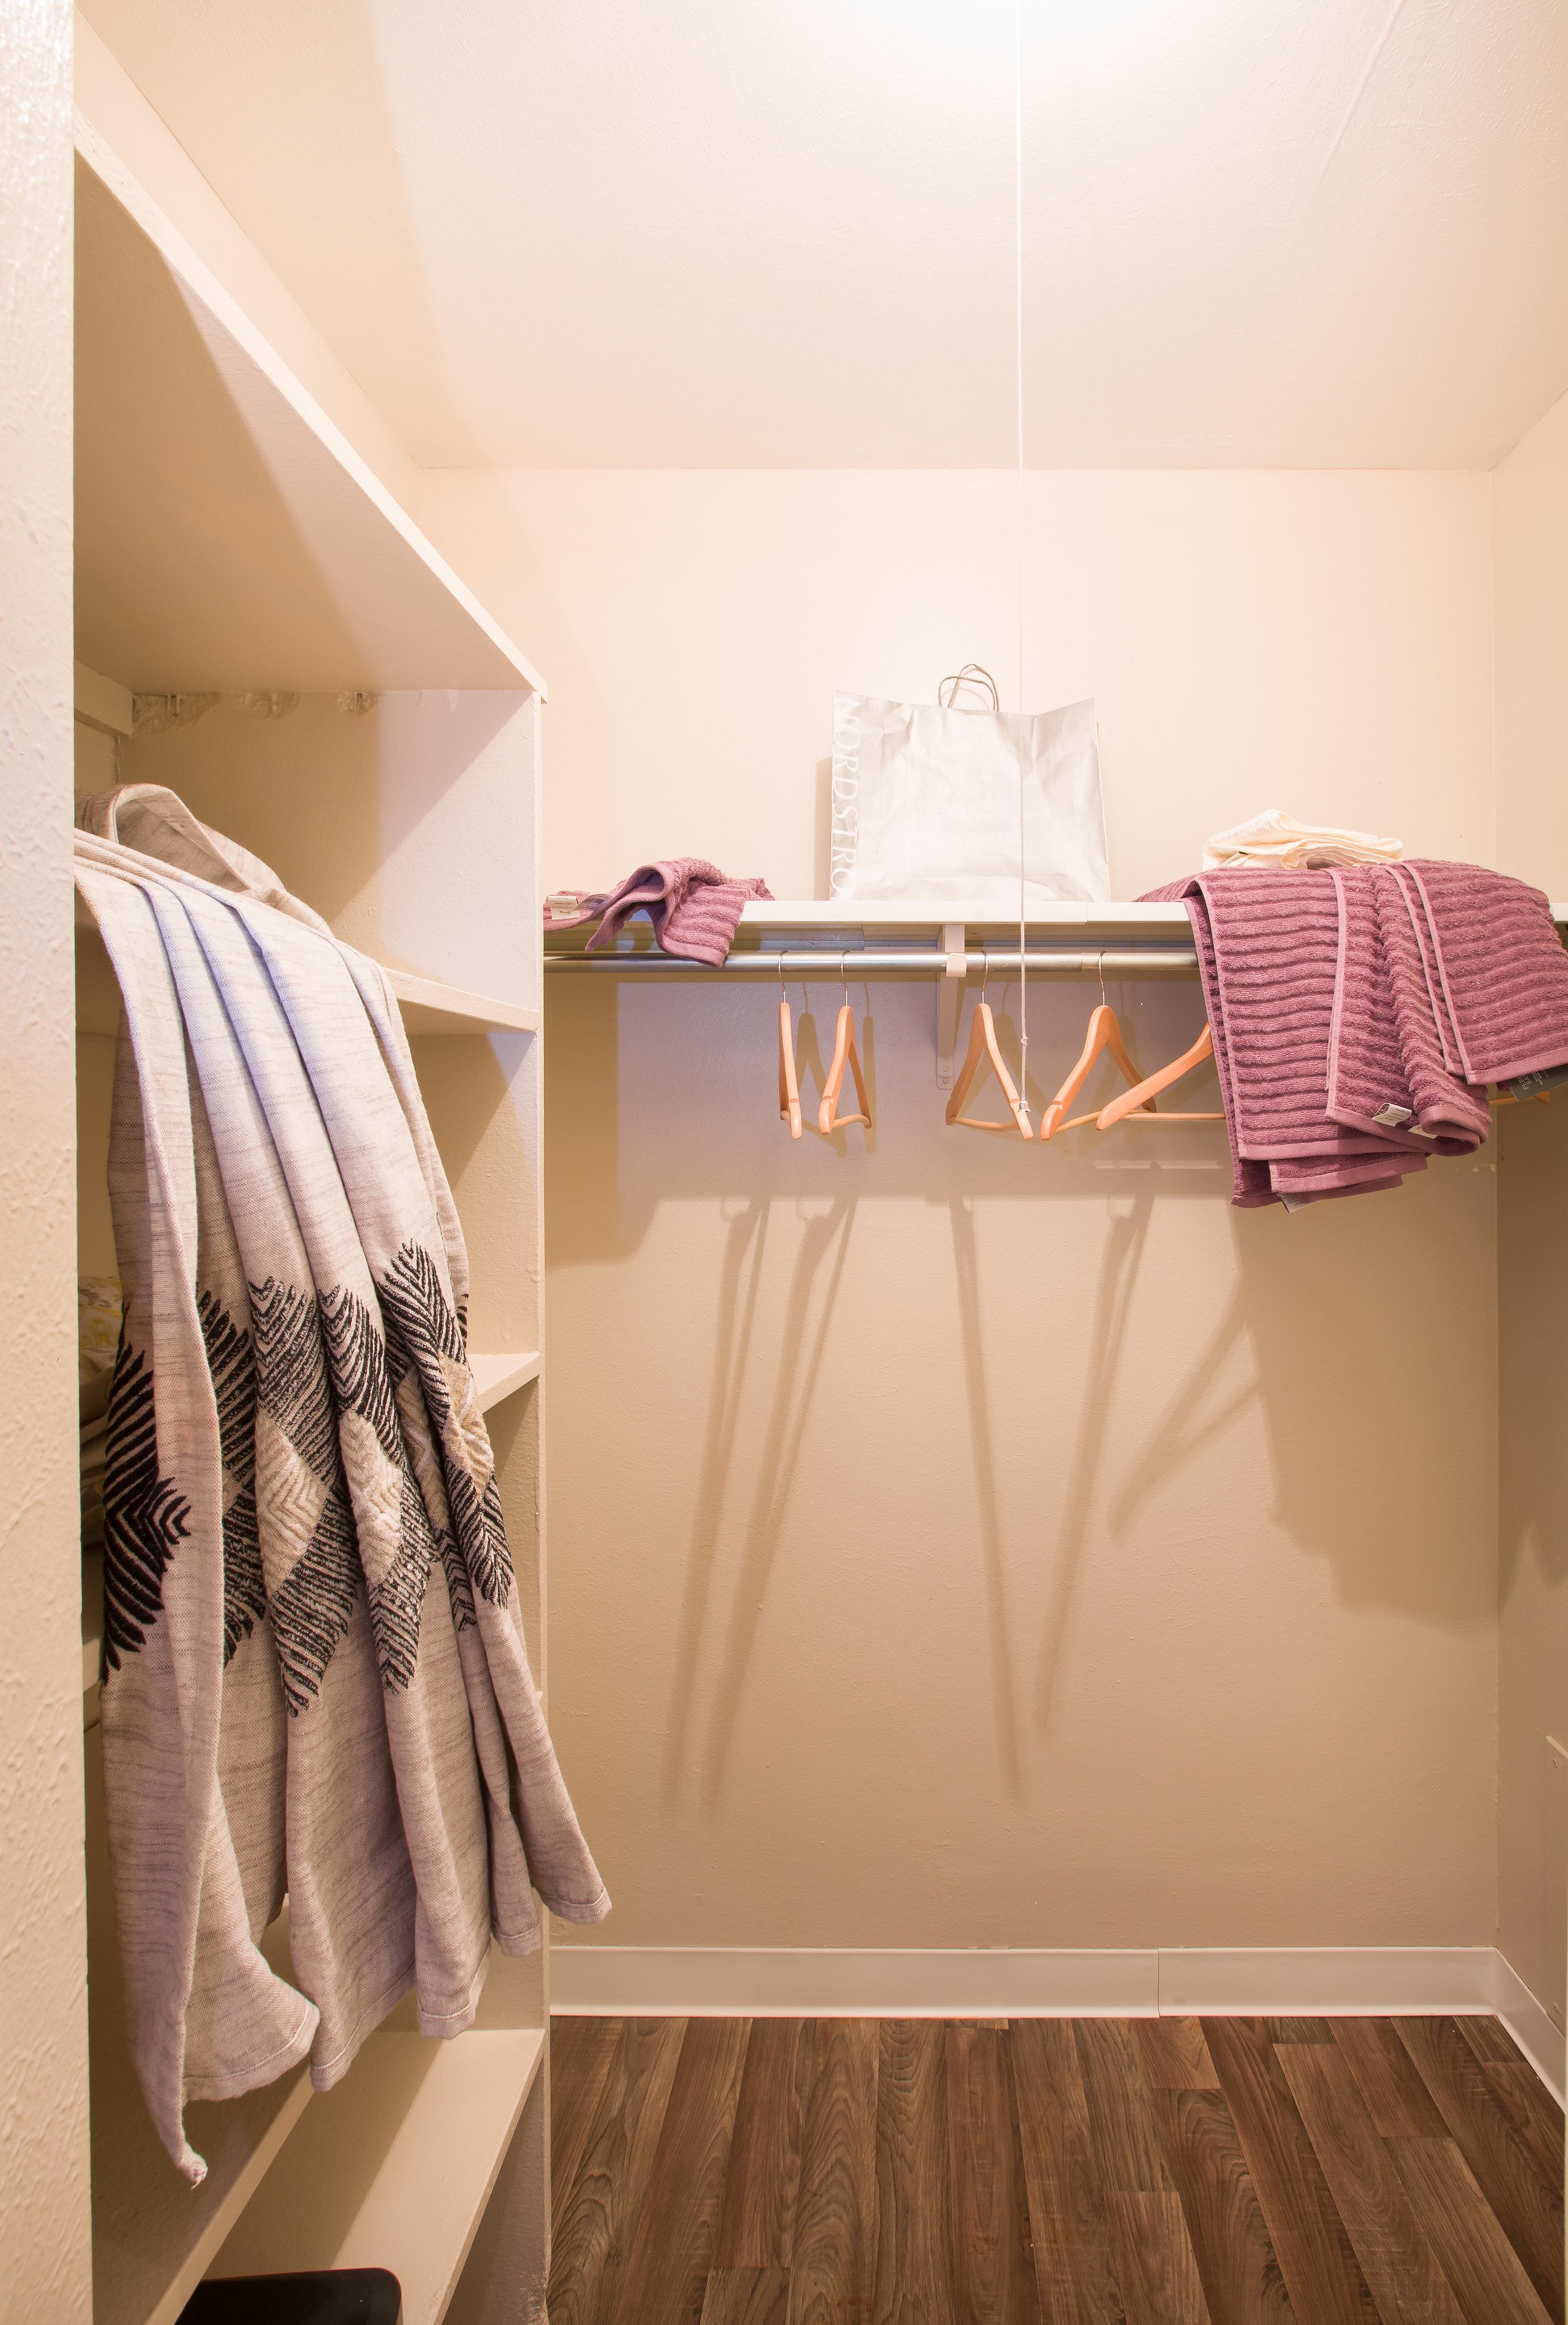 Image of Walk-In Closets for Vista Park